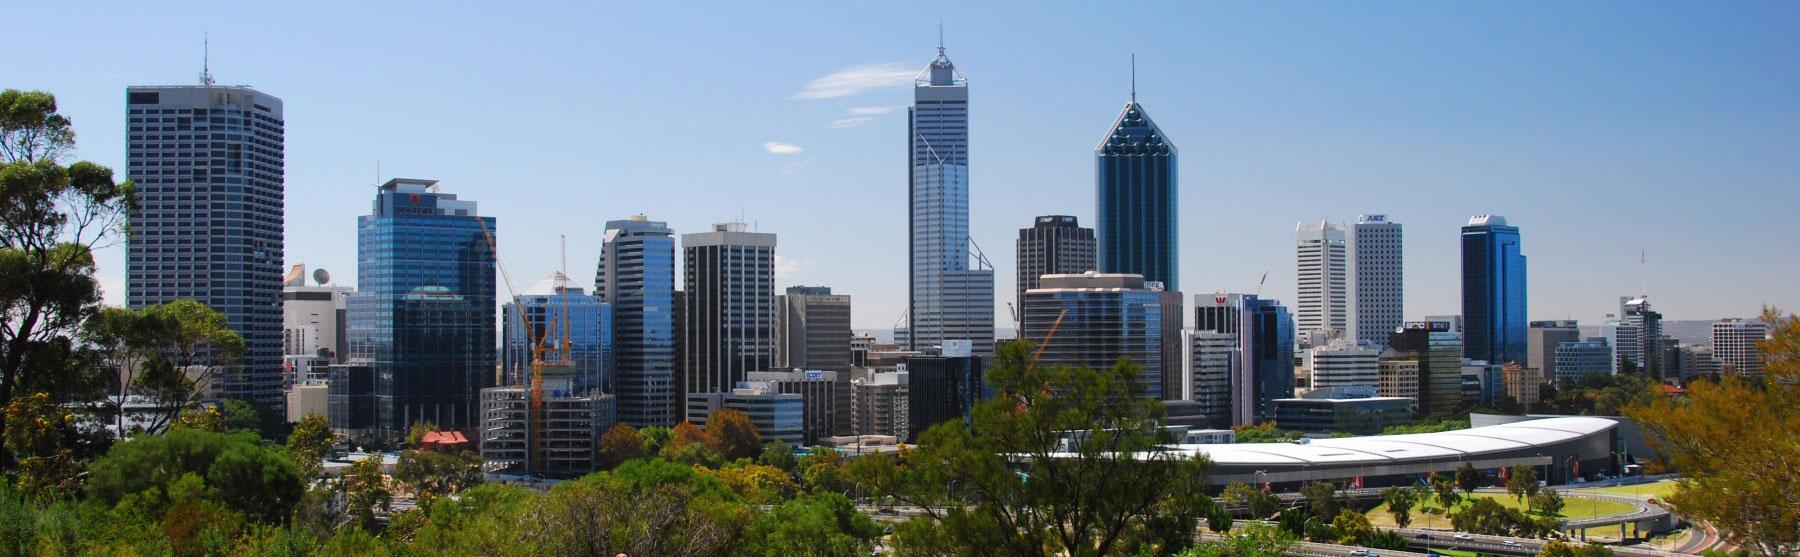 gratis dating sites in Perth West-Australië Speed Dating ETRADE commerciële